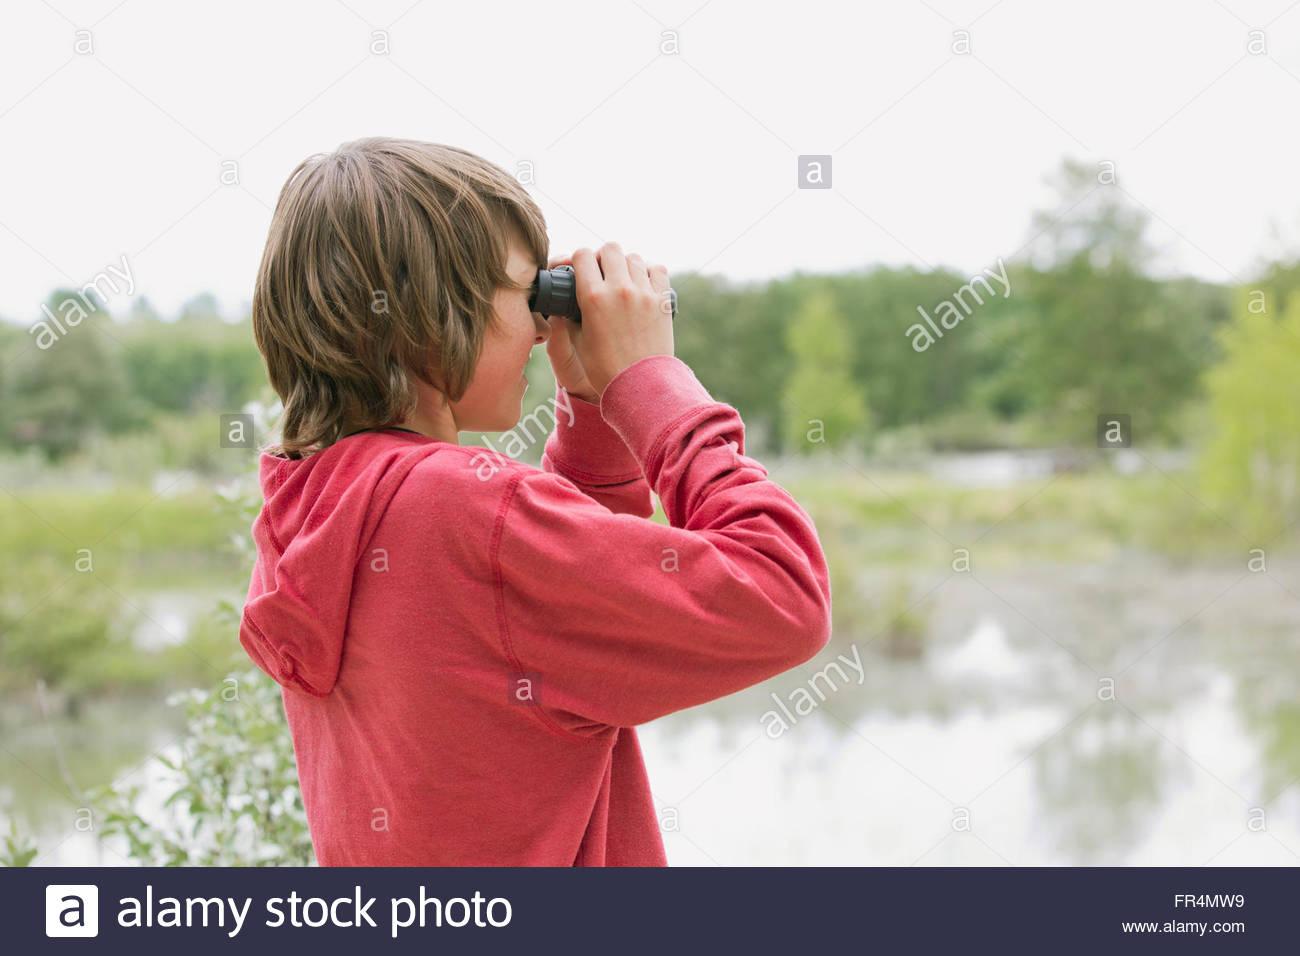 middle school student using binoculars on school trip - Stock Image